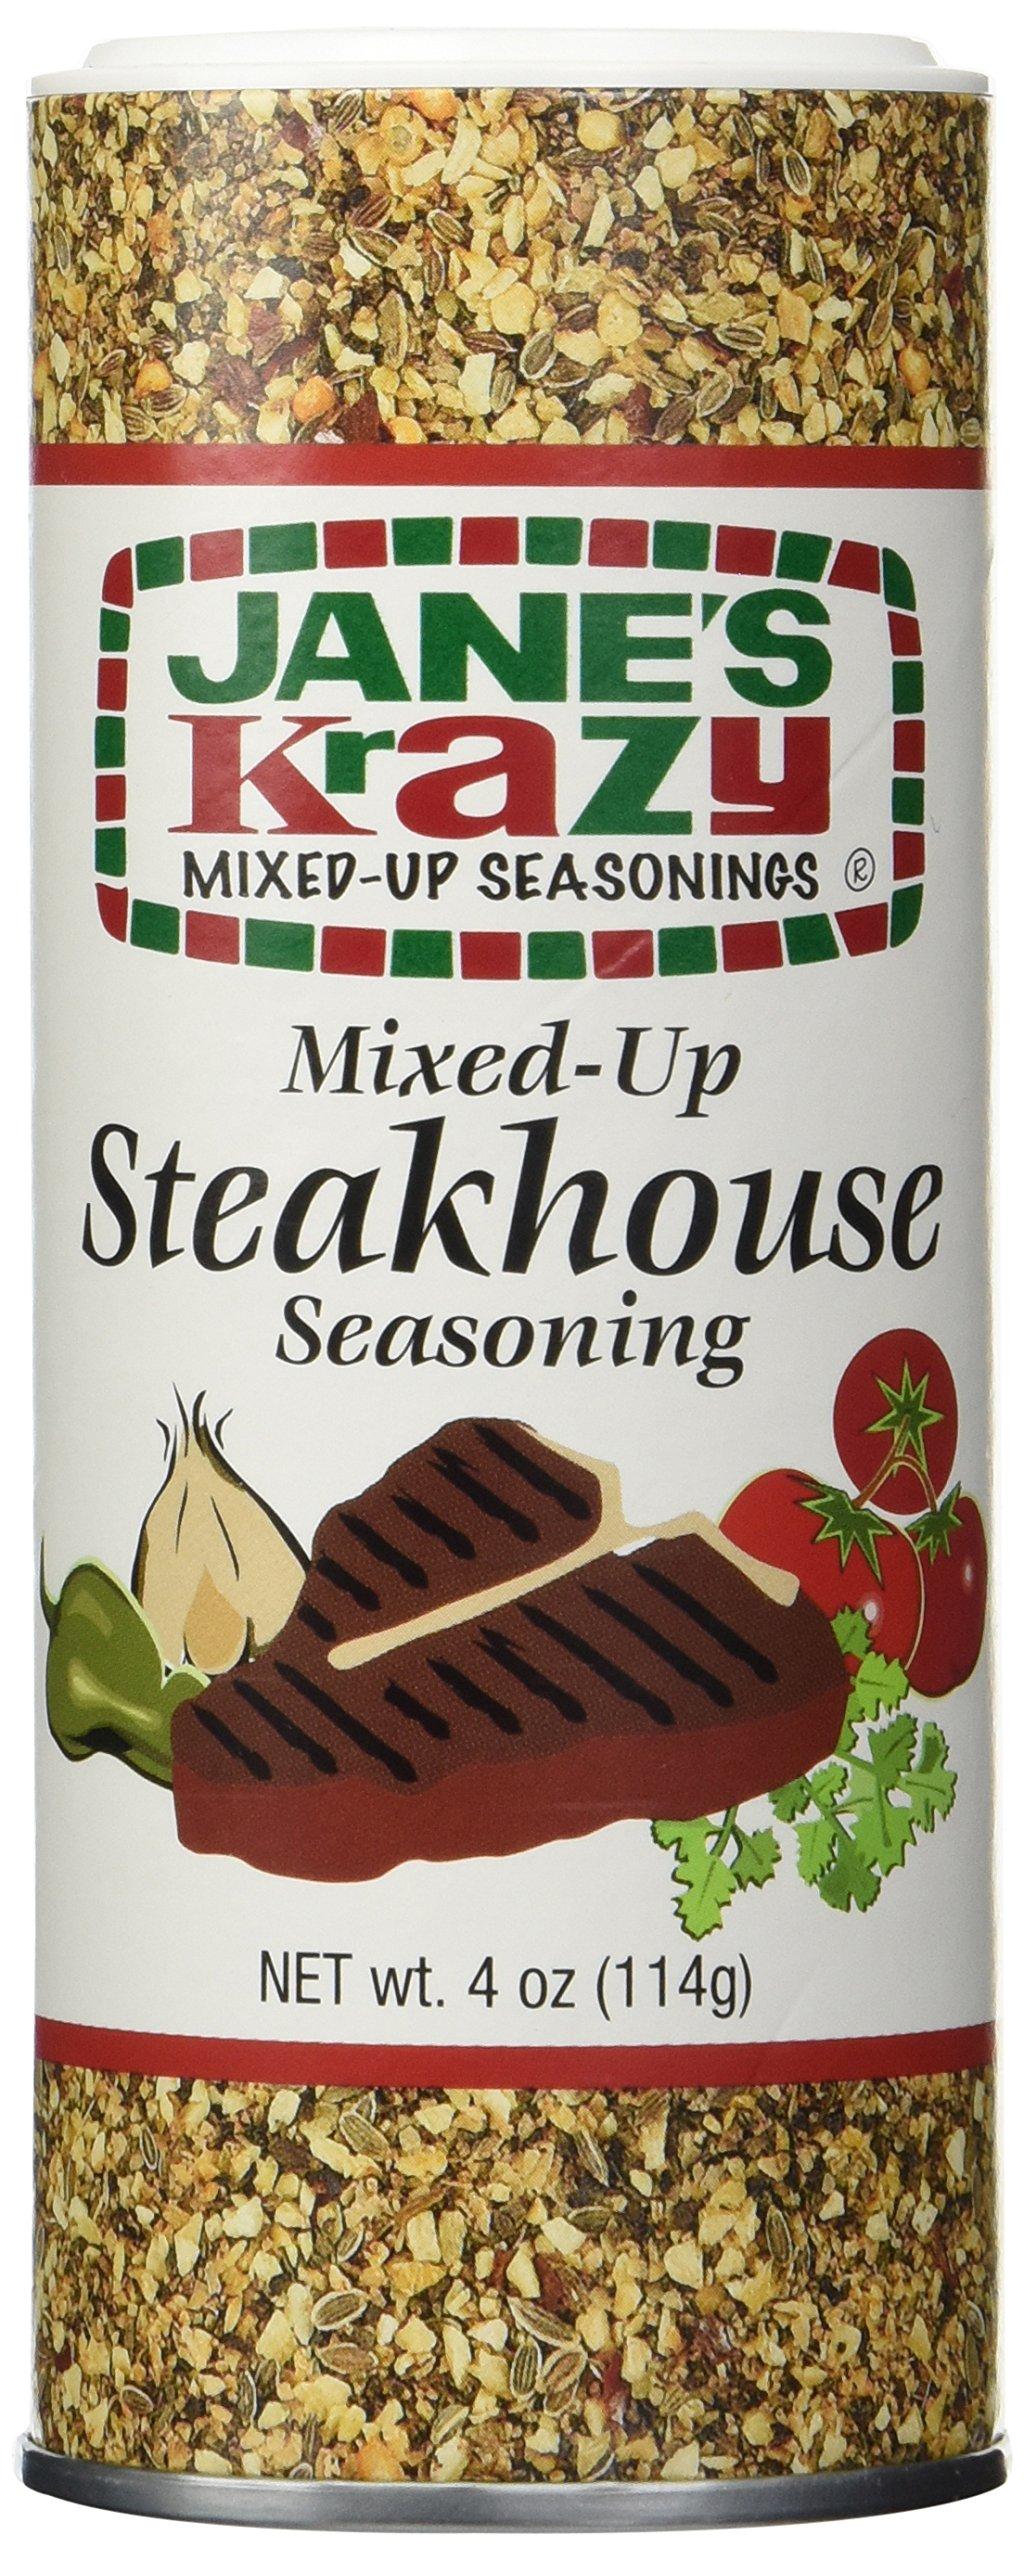 Jane's Krazy Mixed-Up Steakhouse Seasoning - 4 oz